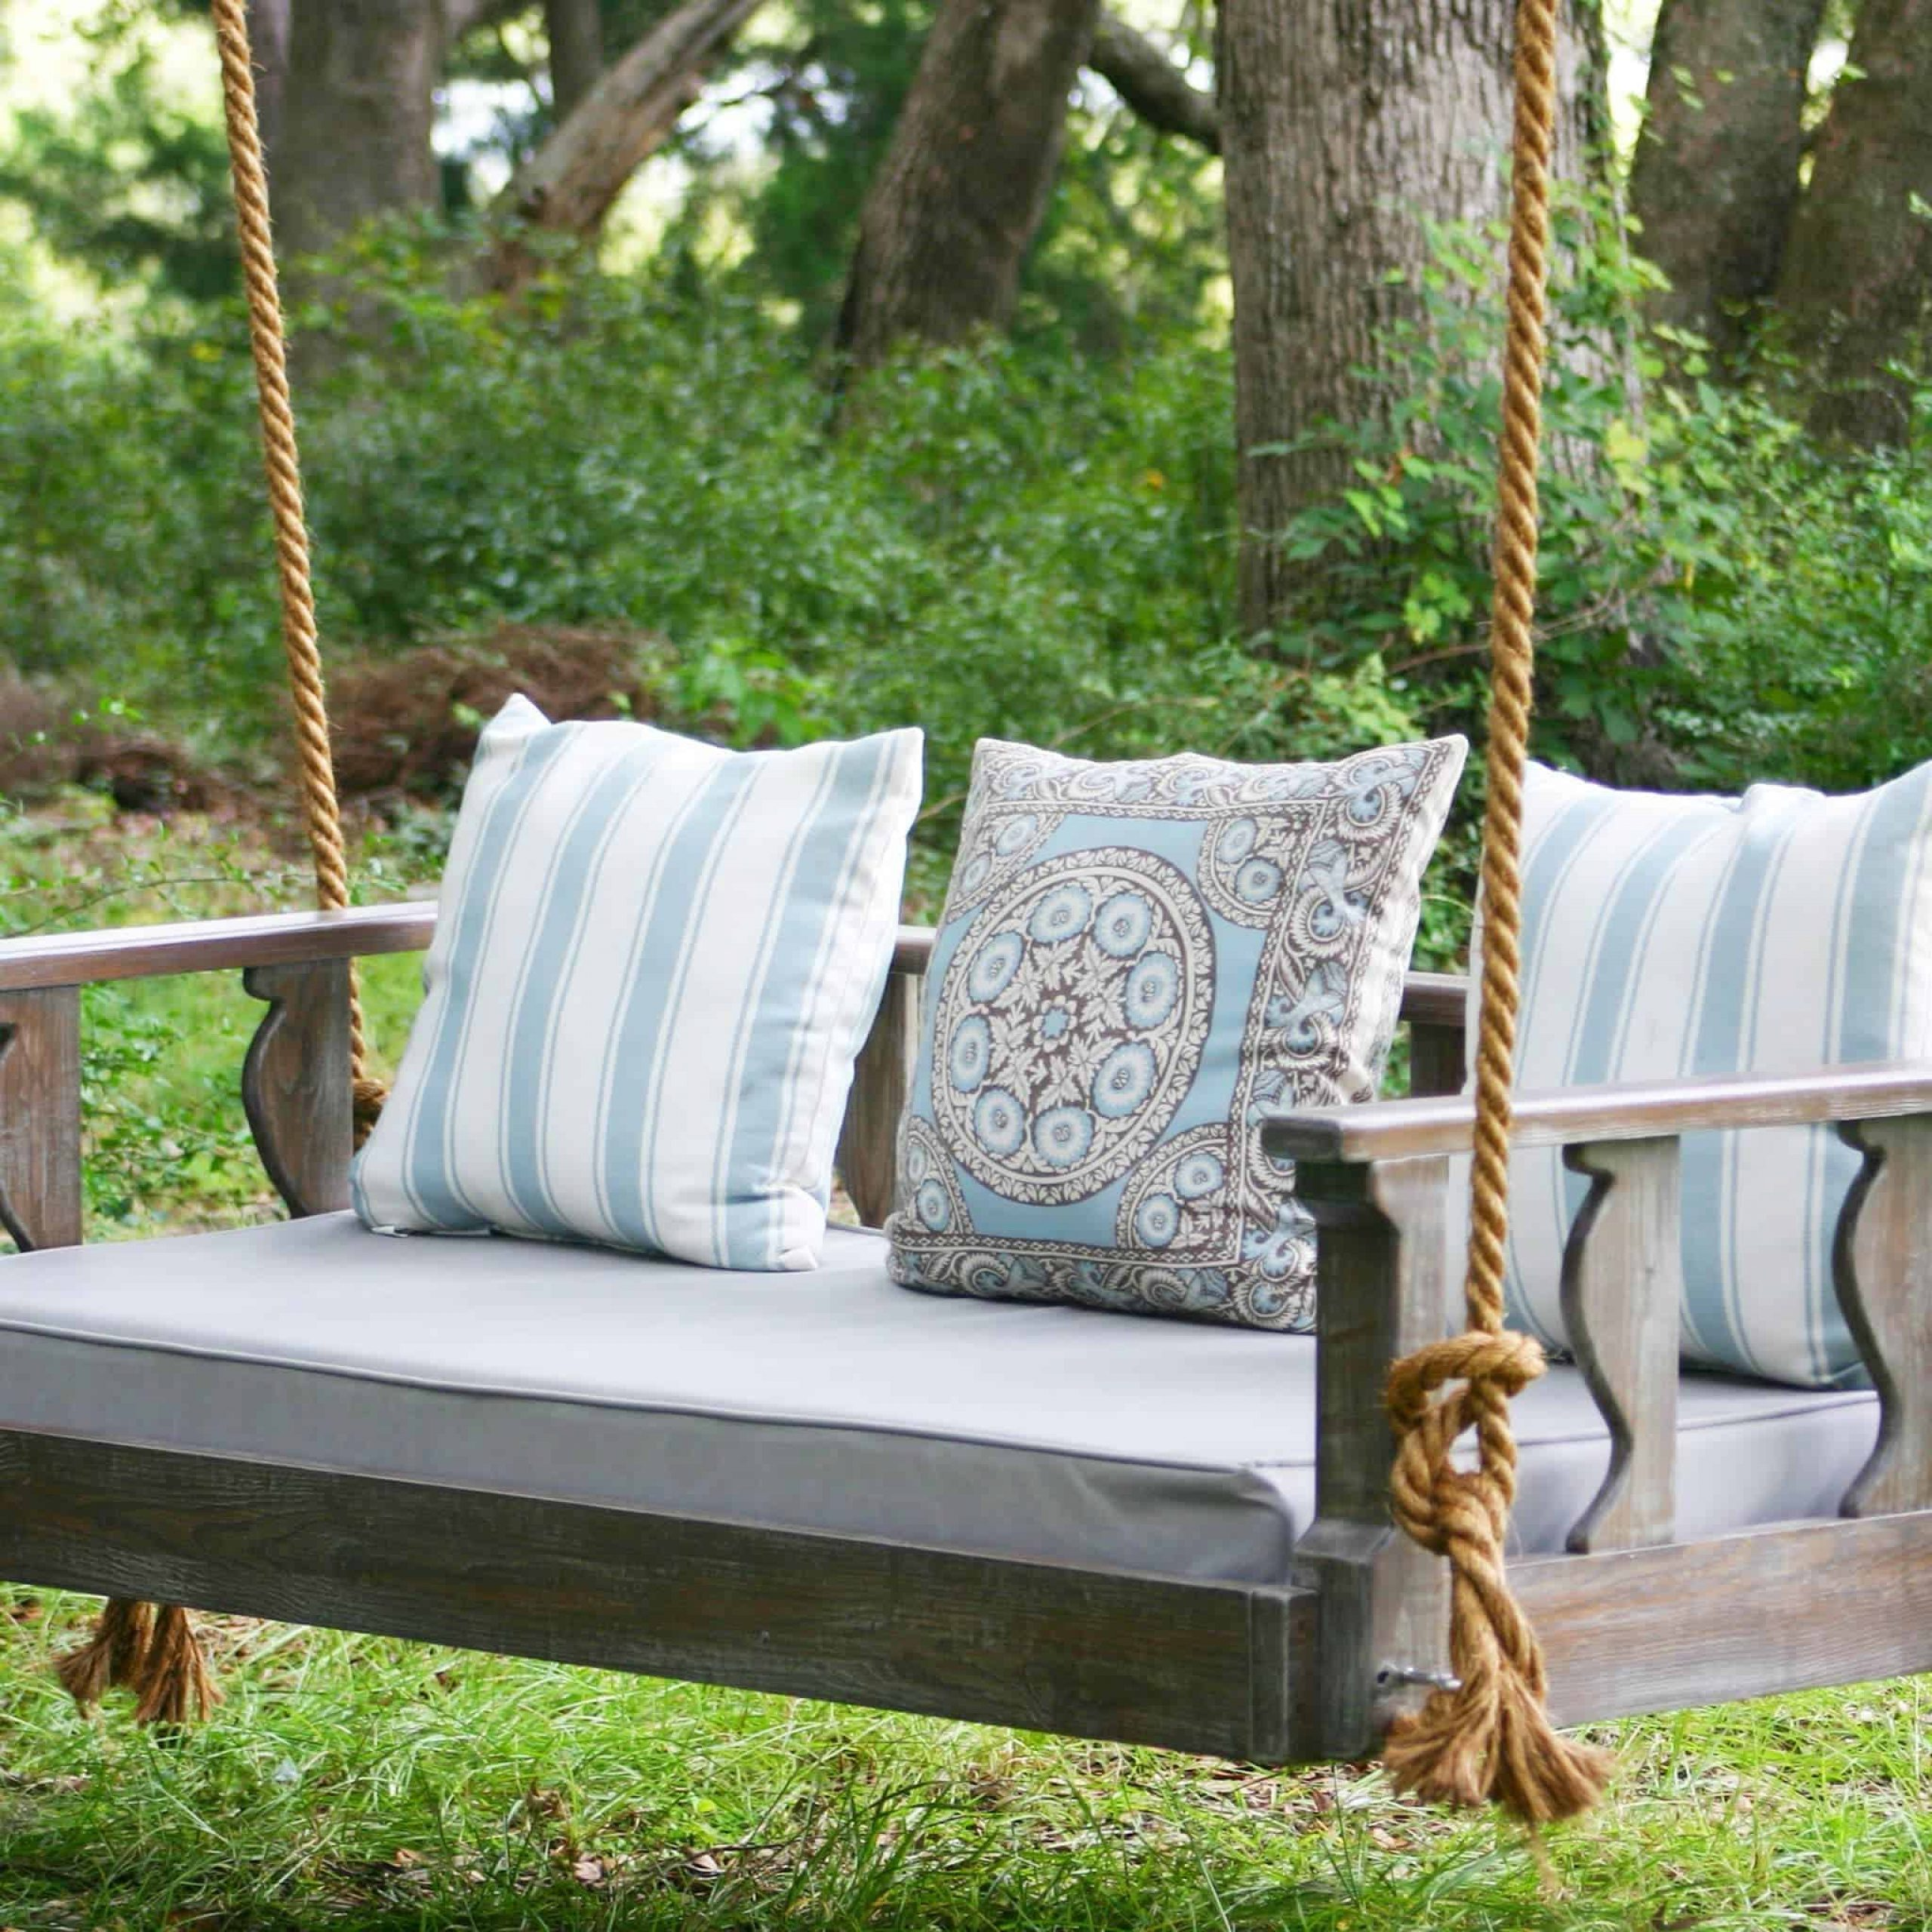 Bed Swings And Porch Swings, Handmadevintage Porch Swings With Trendy Plain Porch Swings (View 9 of 30)